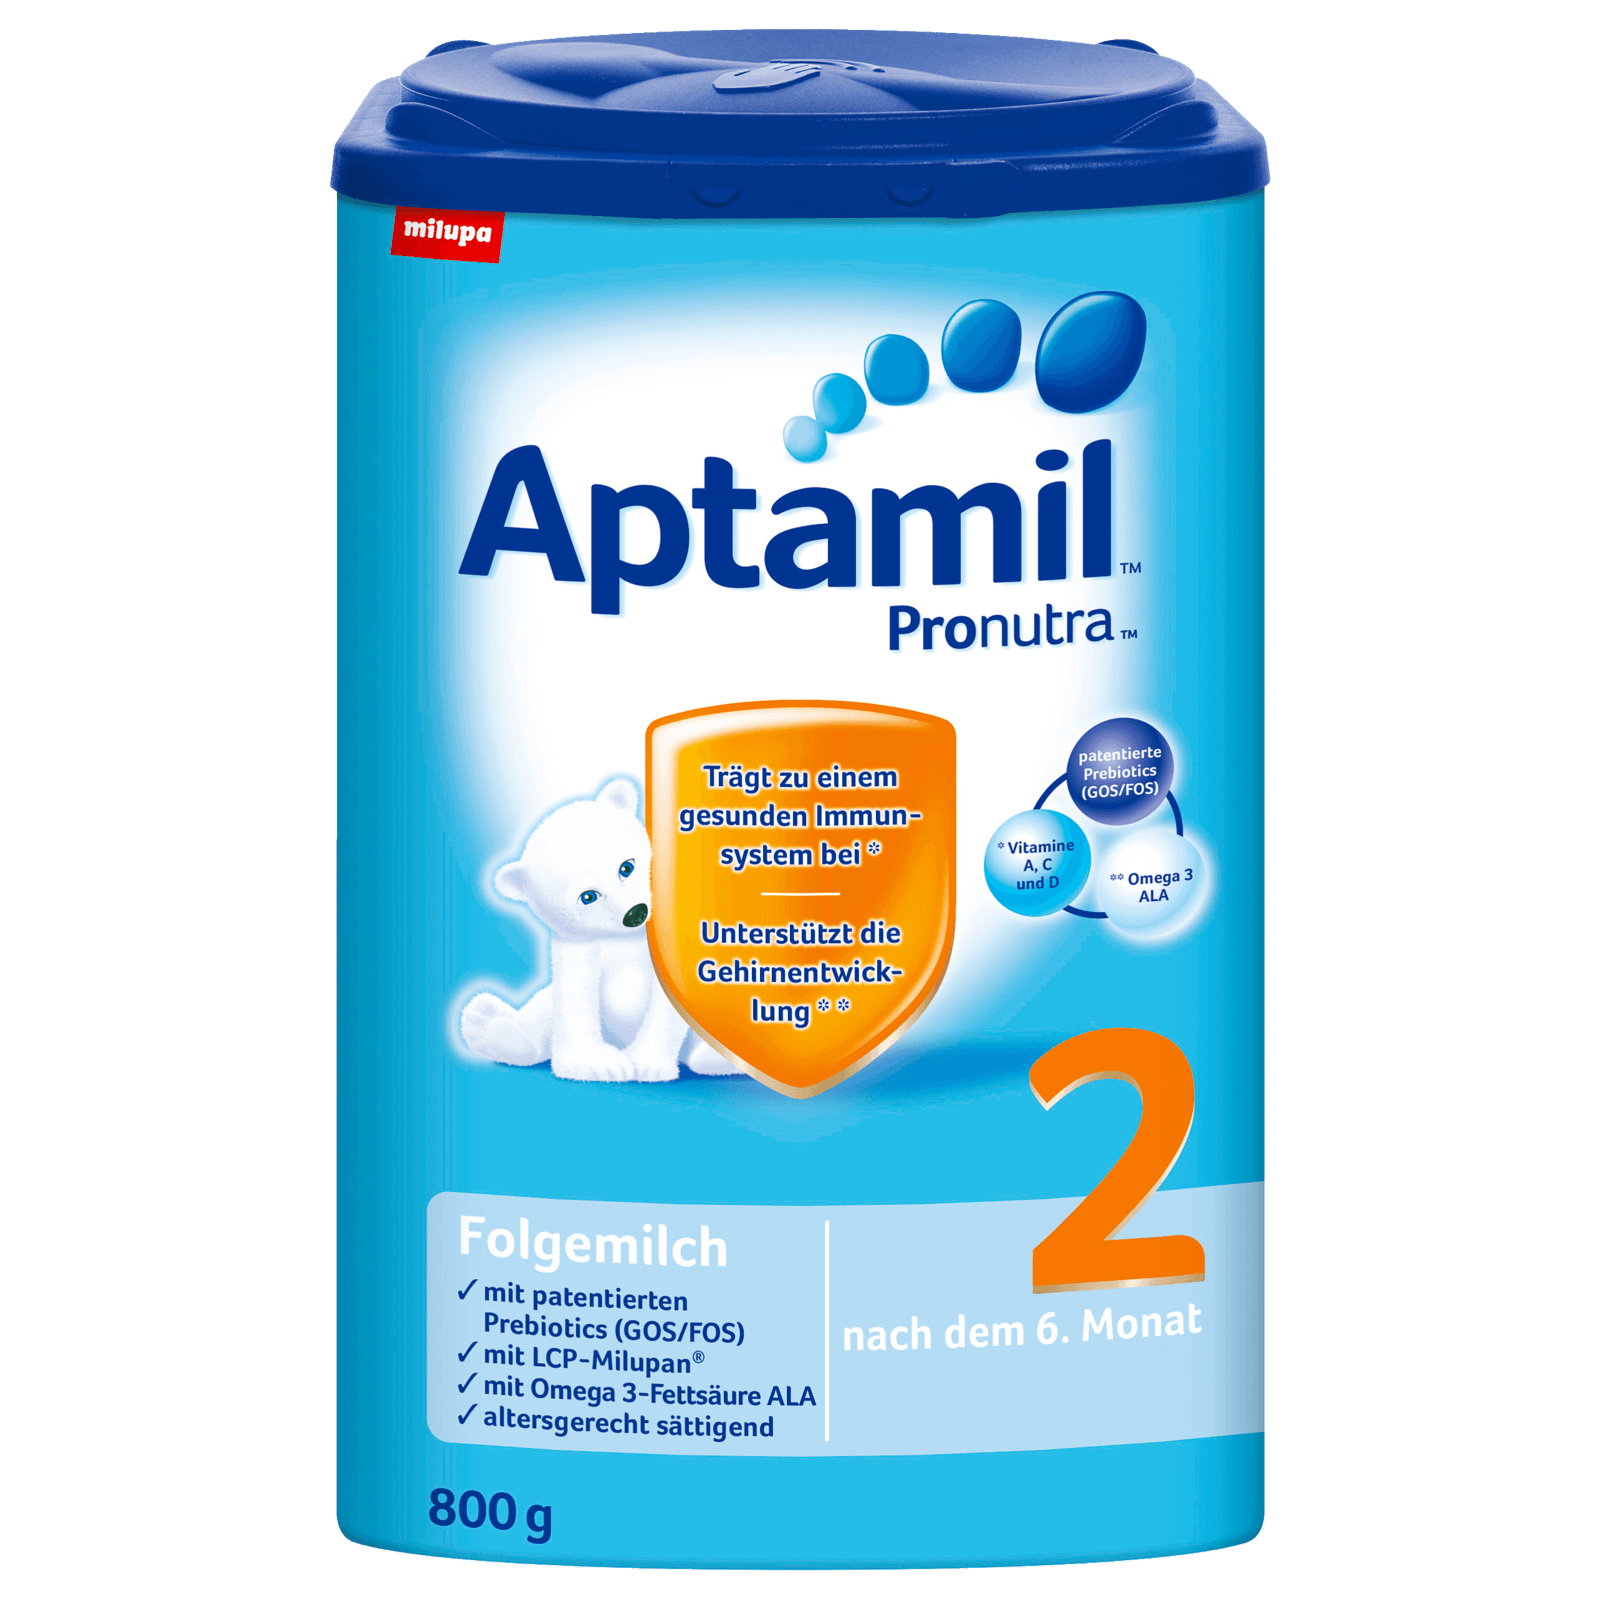 Aptamil 2 Pronutra 800g